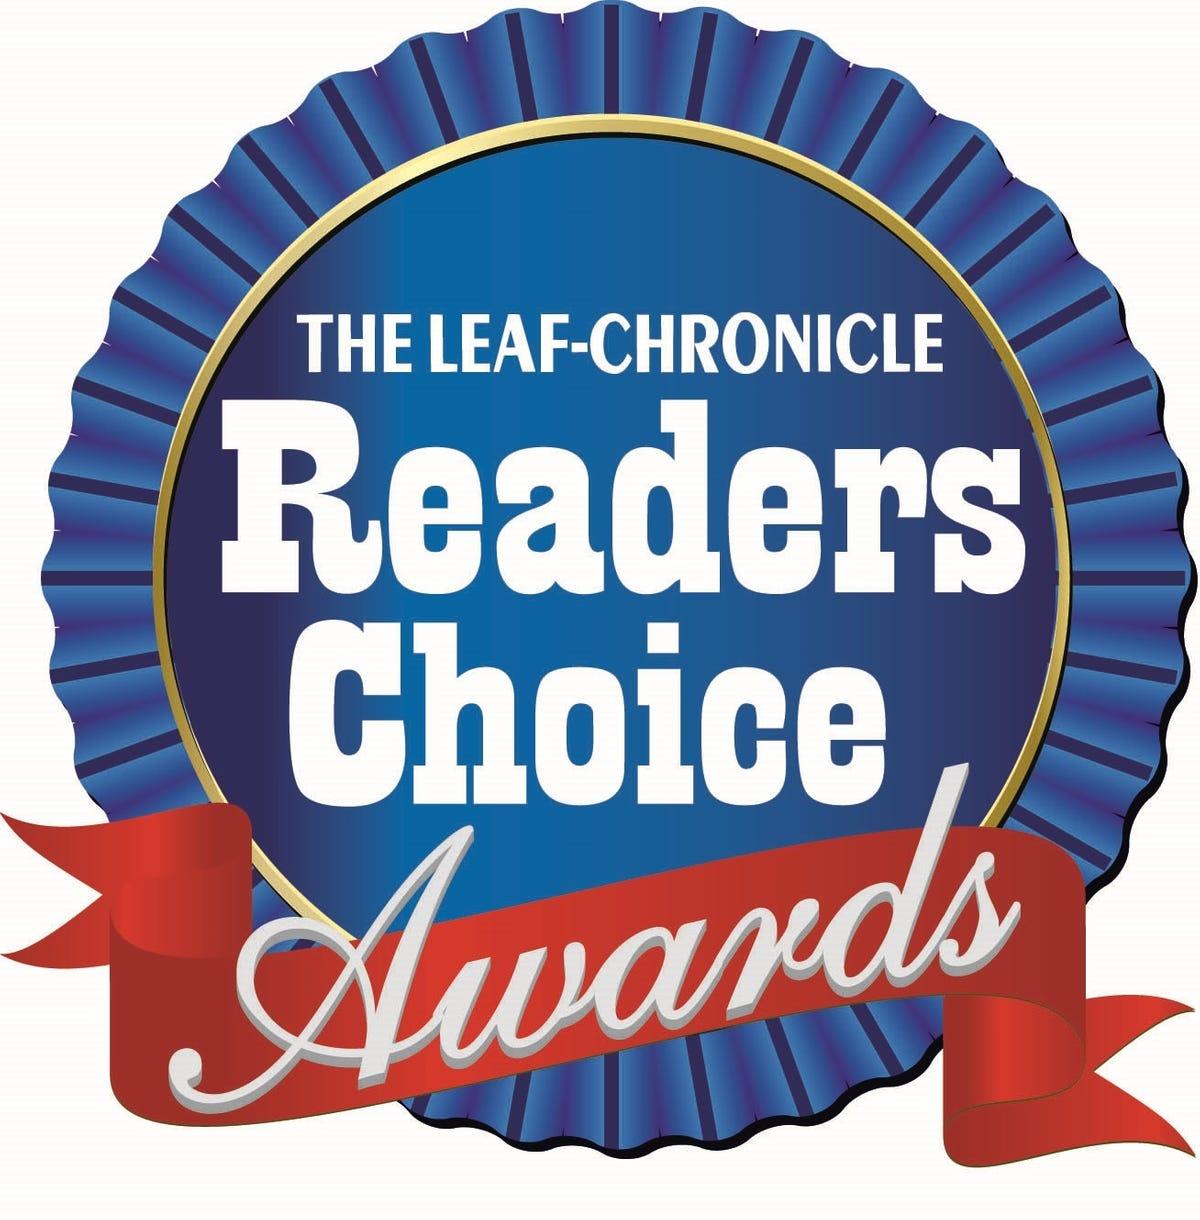 636241558597164928-readers-choice-logo.jpg